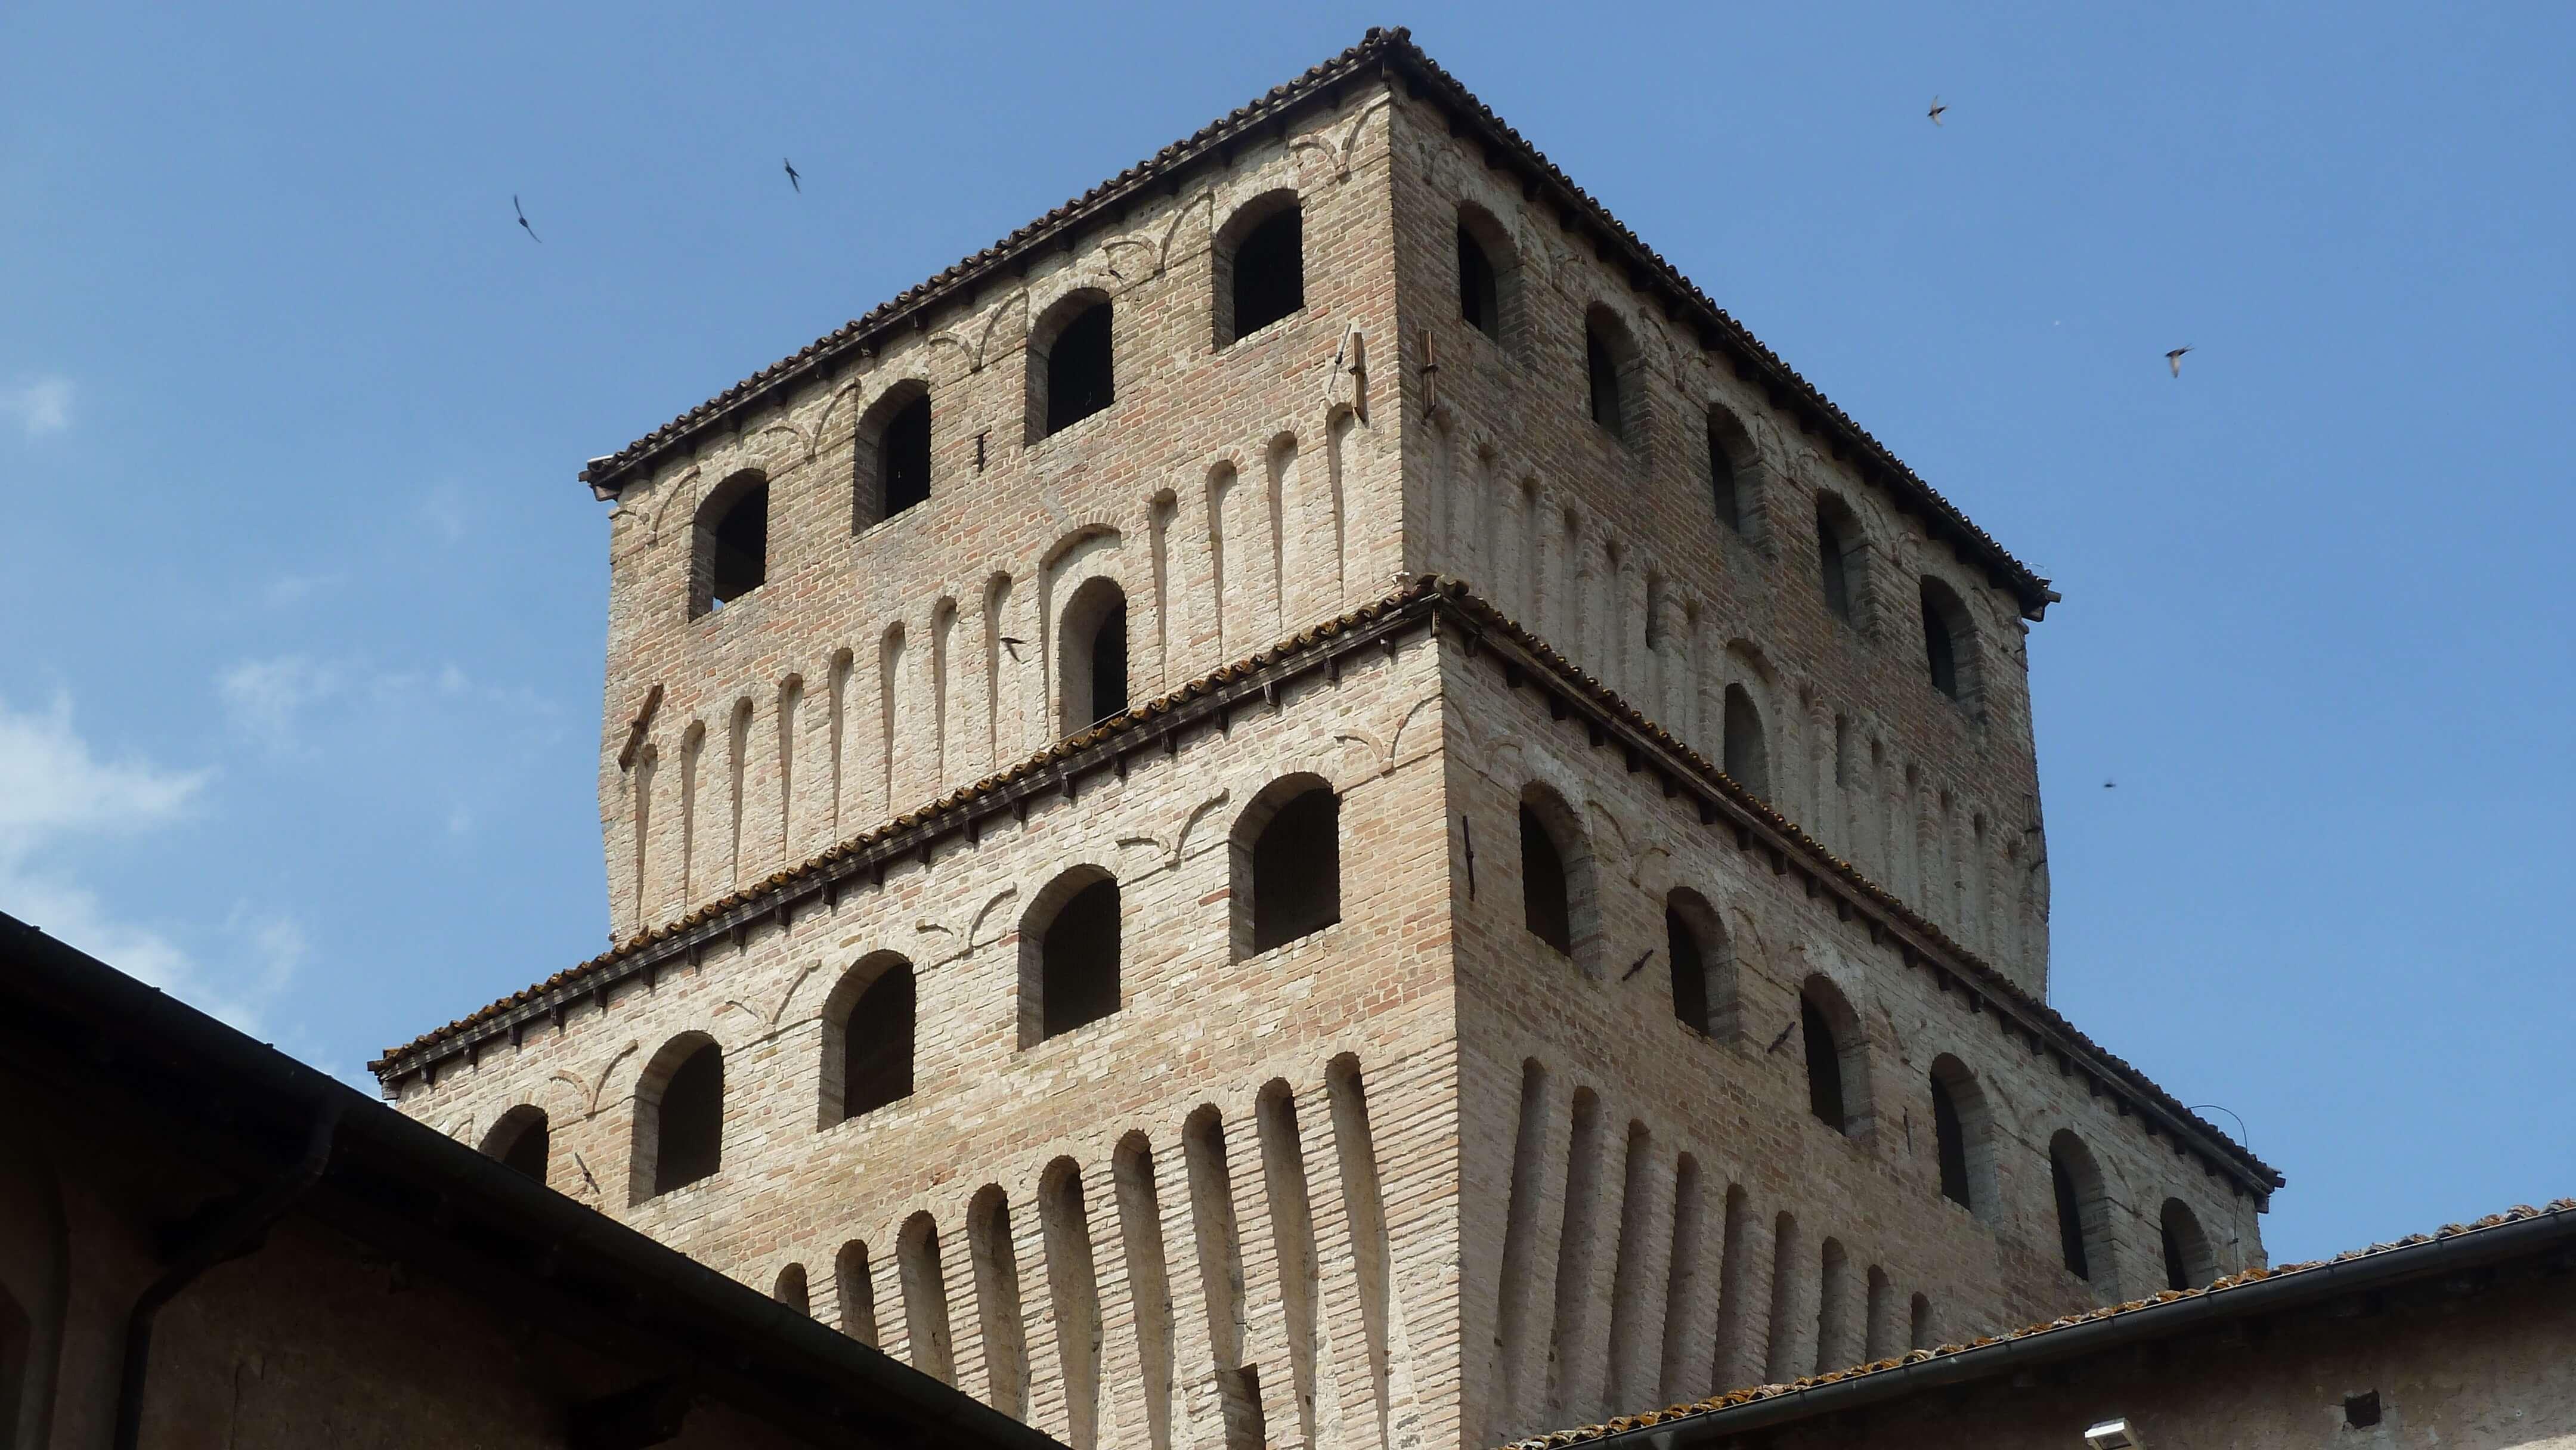 borgo-medievale-di-Torrechiara-Parma